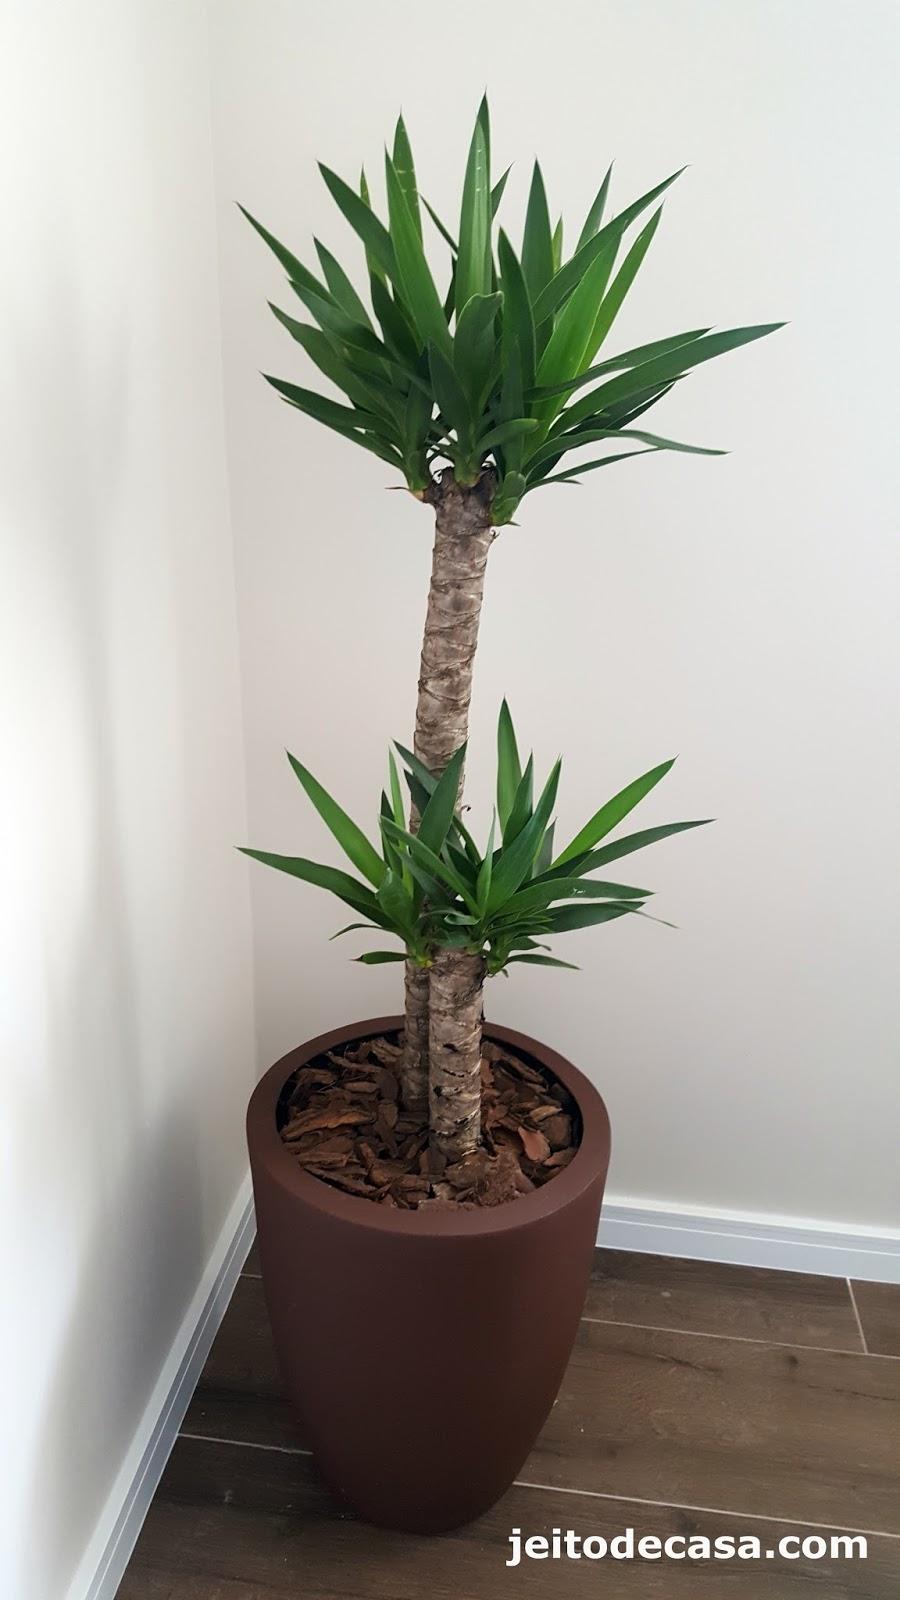 Plantas para escrit rio jeito de casa blog de for Plantas decorativas para oficina